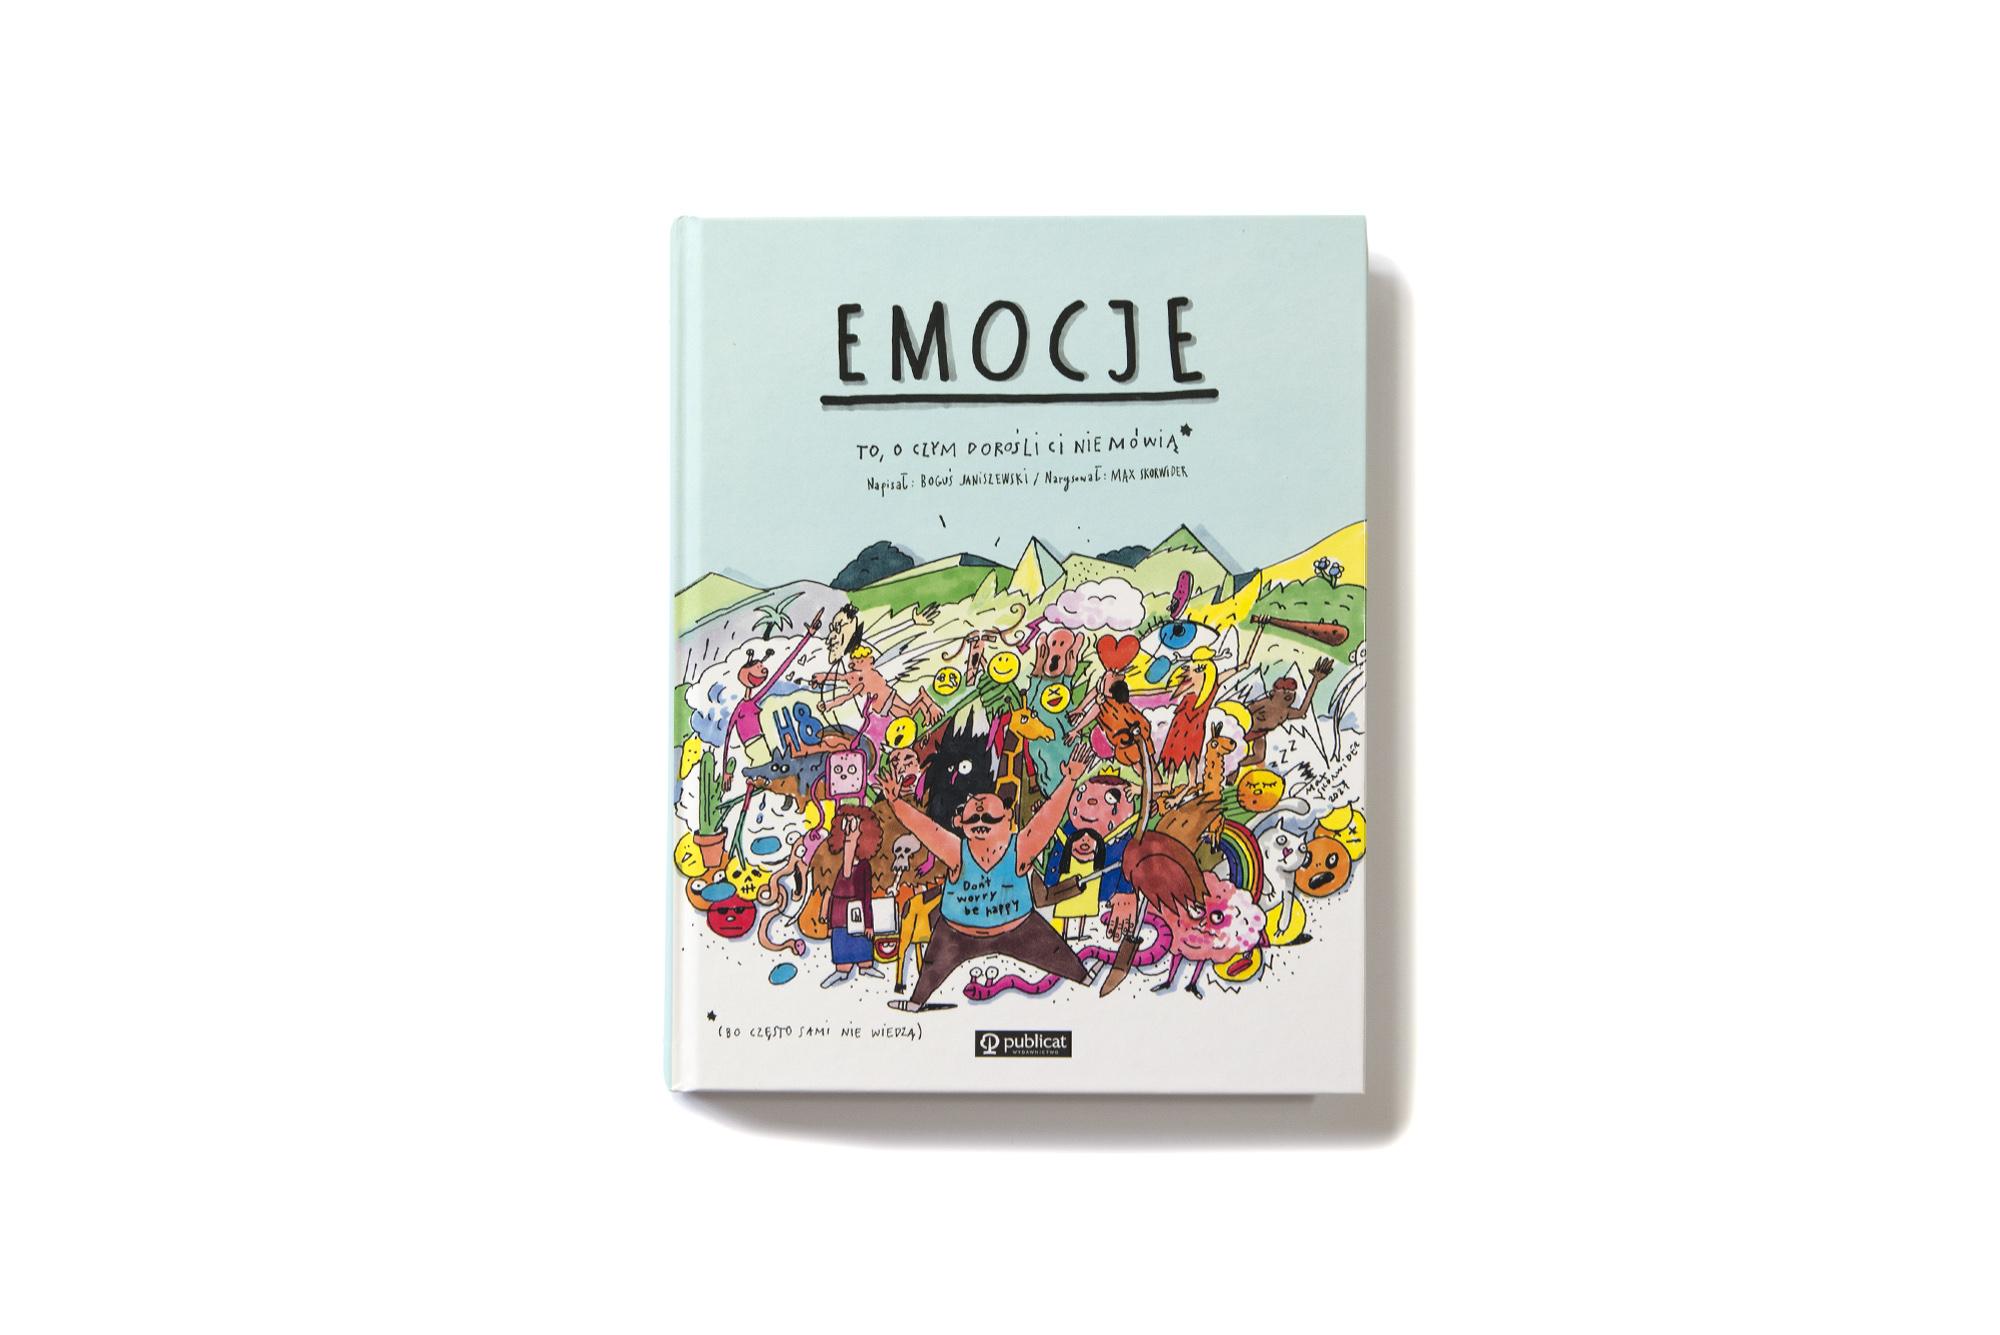 Książka Emocje - KumamGre.pl